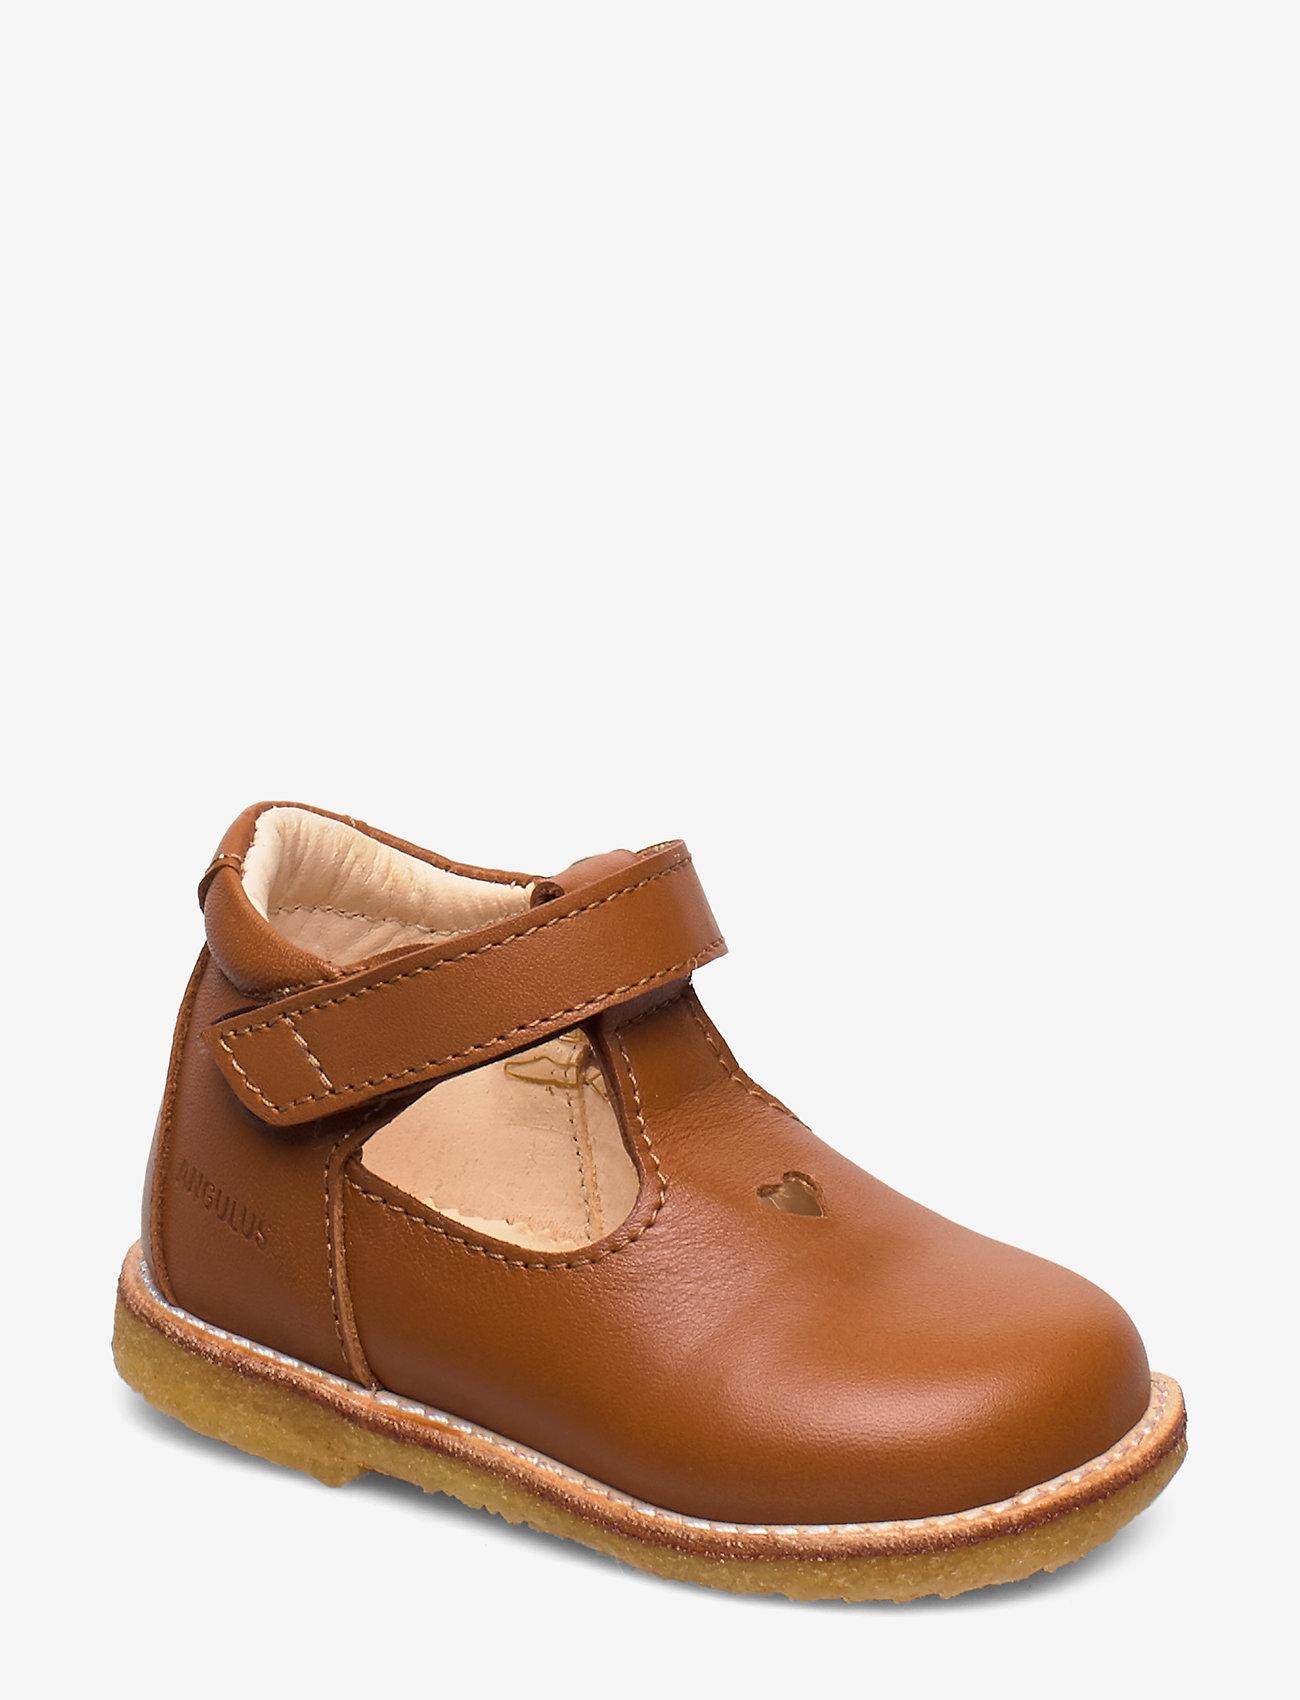 ANGULUS - ***T - bar Shoe*** - sandaler - 1431 cognac - 0